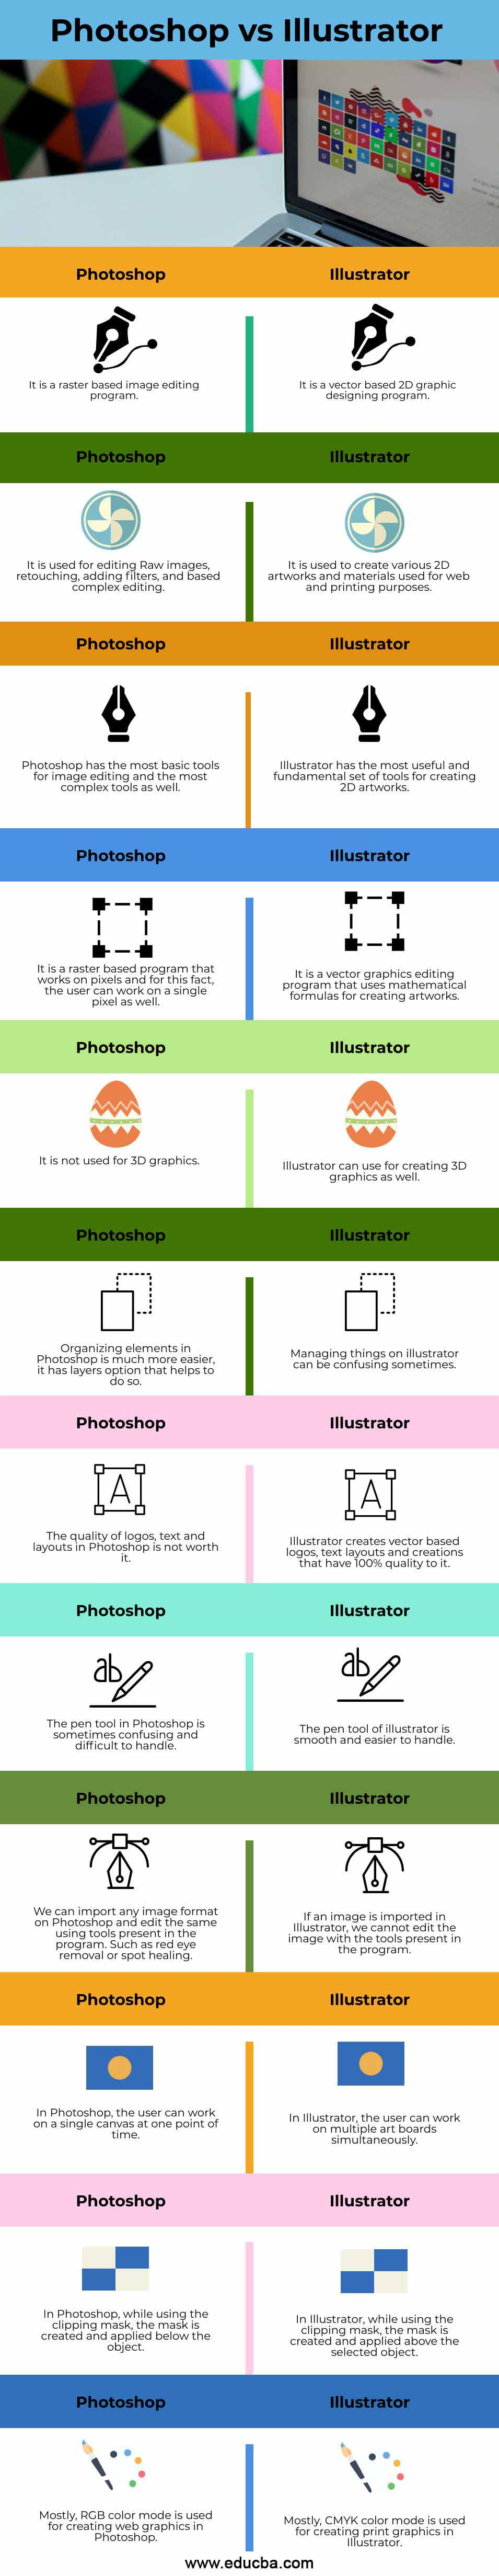 Photoshop vs Illustrator info